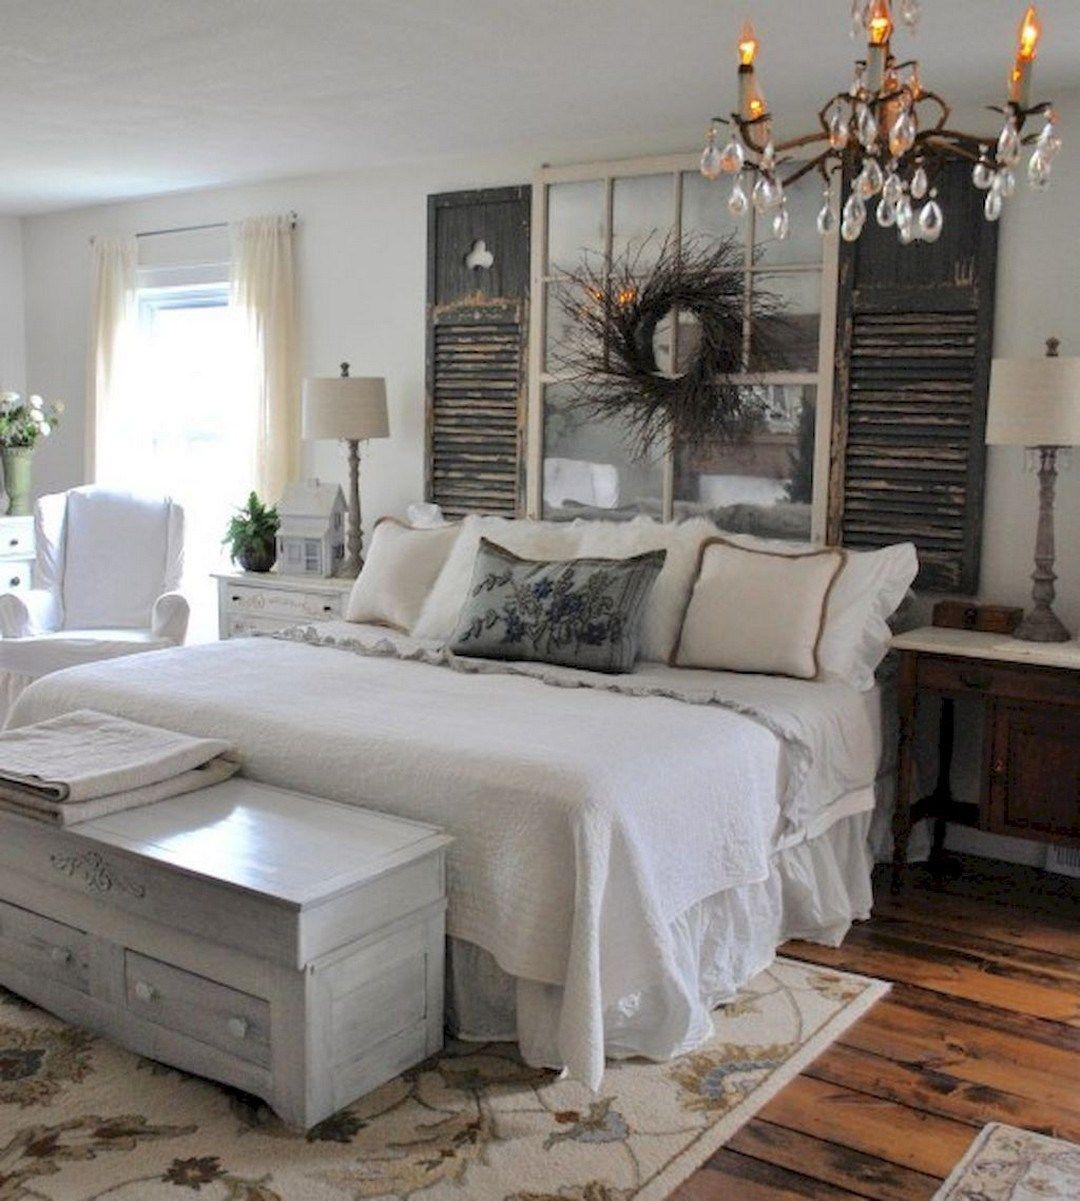 18 Ideas That Will Transform: Rustic Farmhouse Bedroom Decorating Ideas To Transform